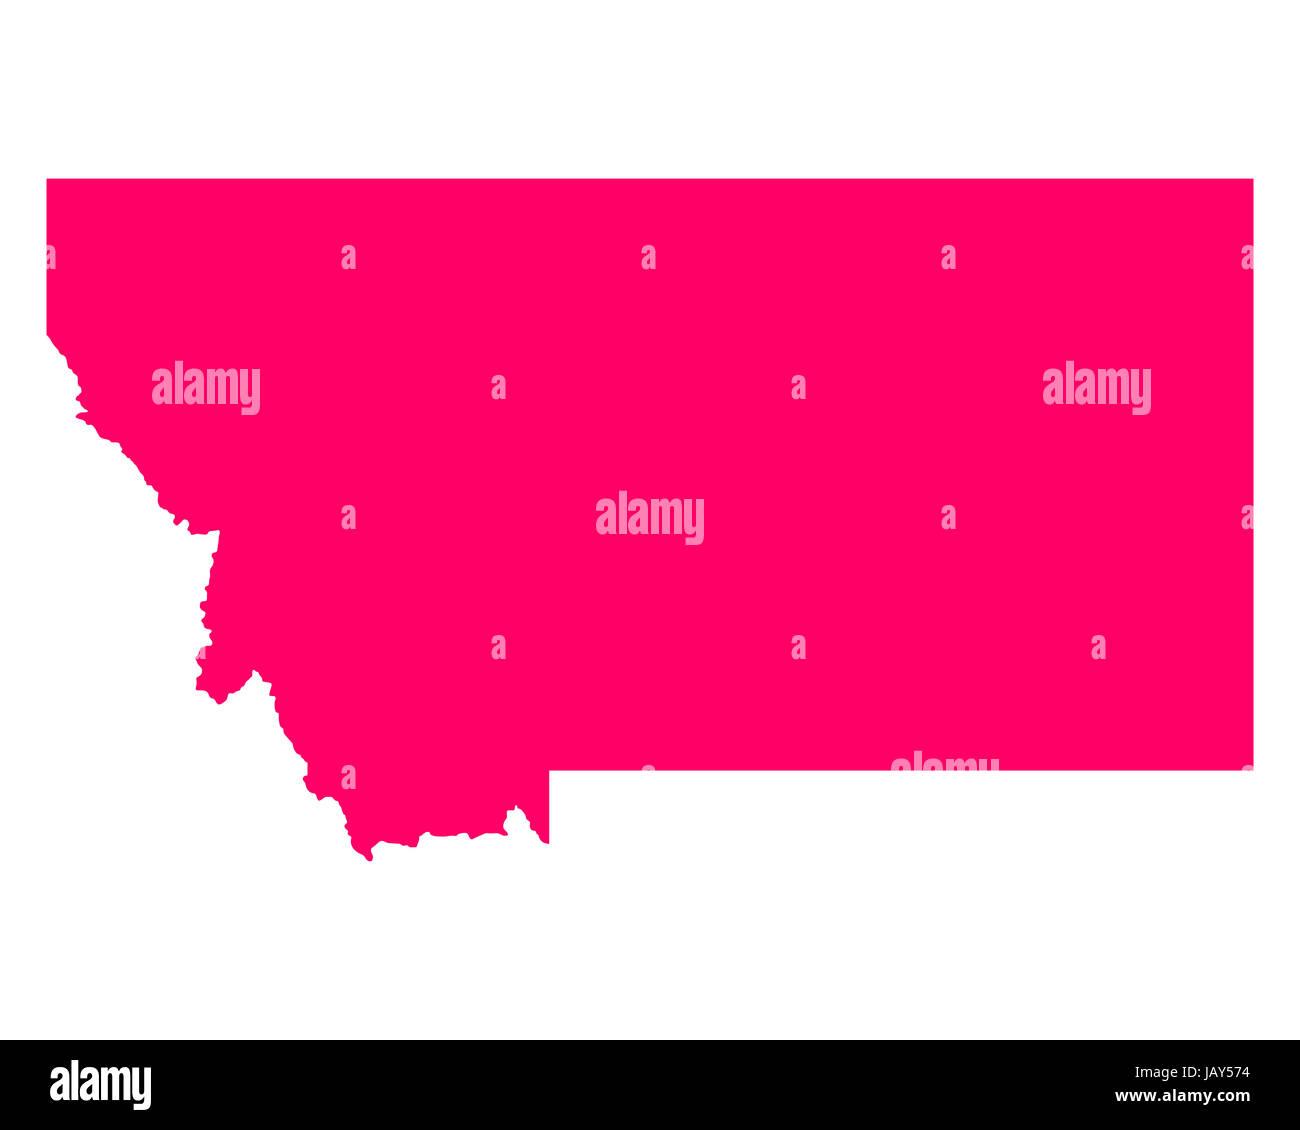 Karte von Montana - Stock Image